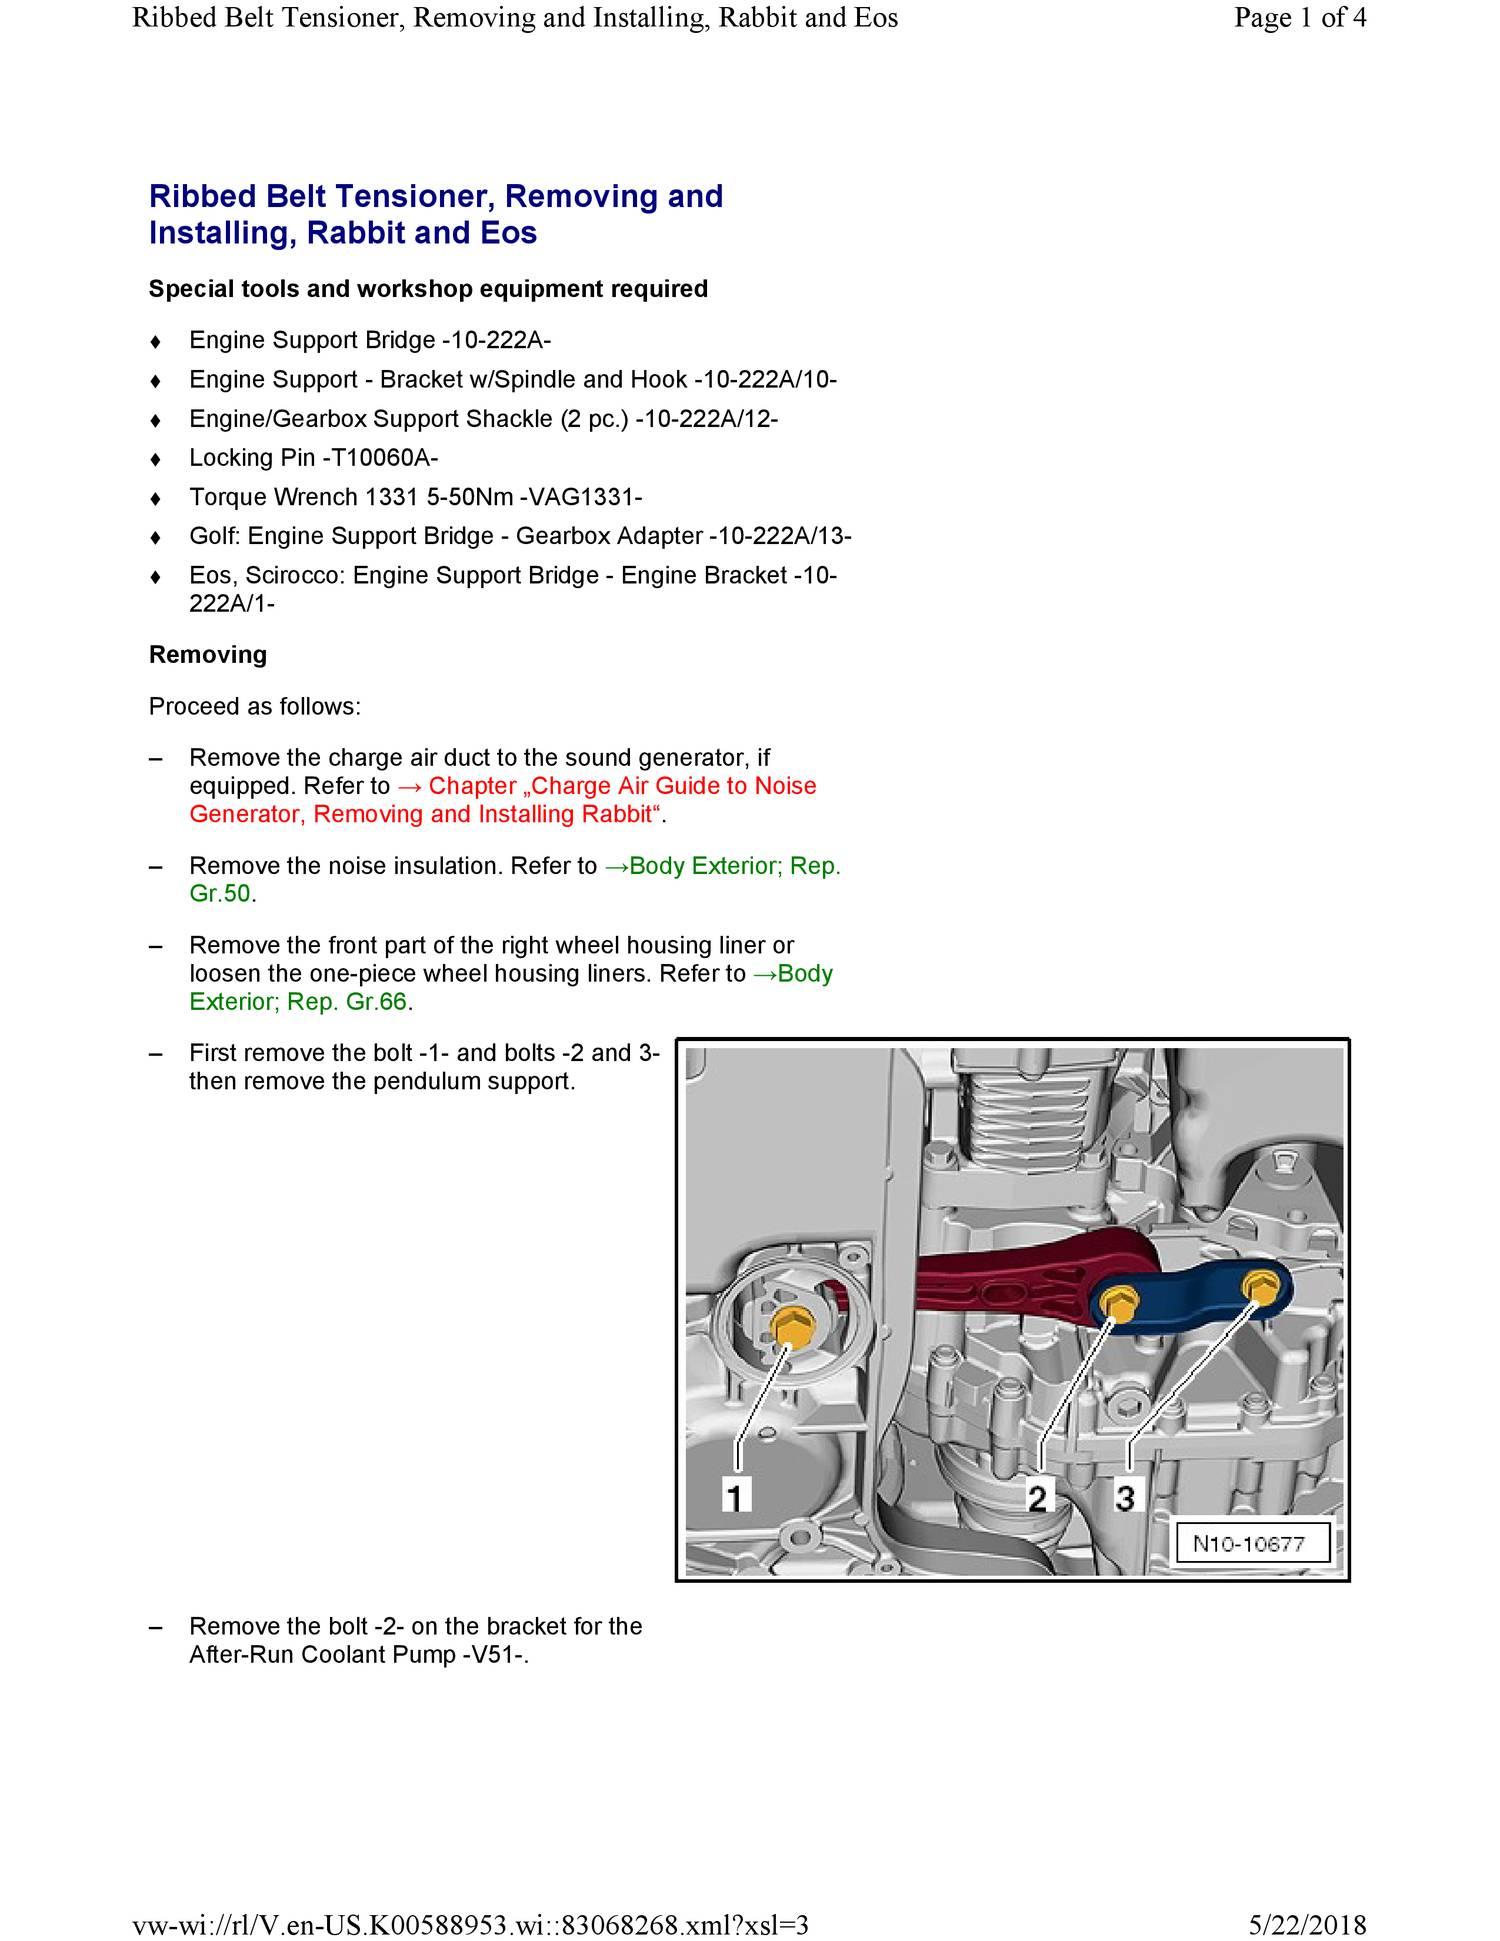 tensioner pdf | DocDroid